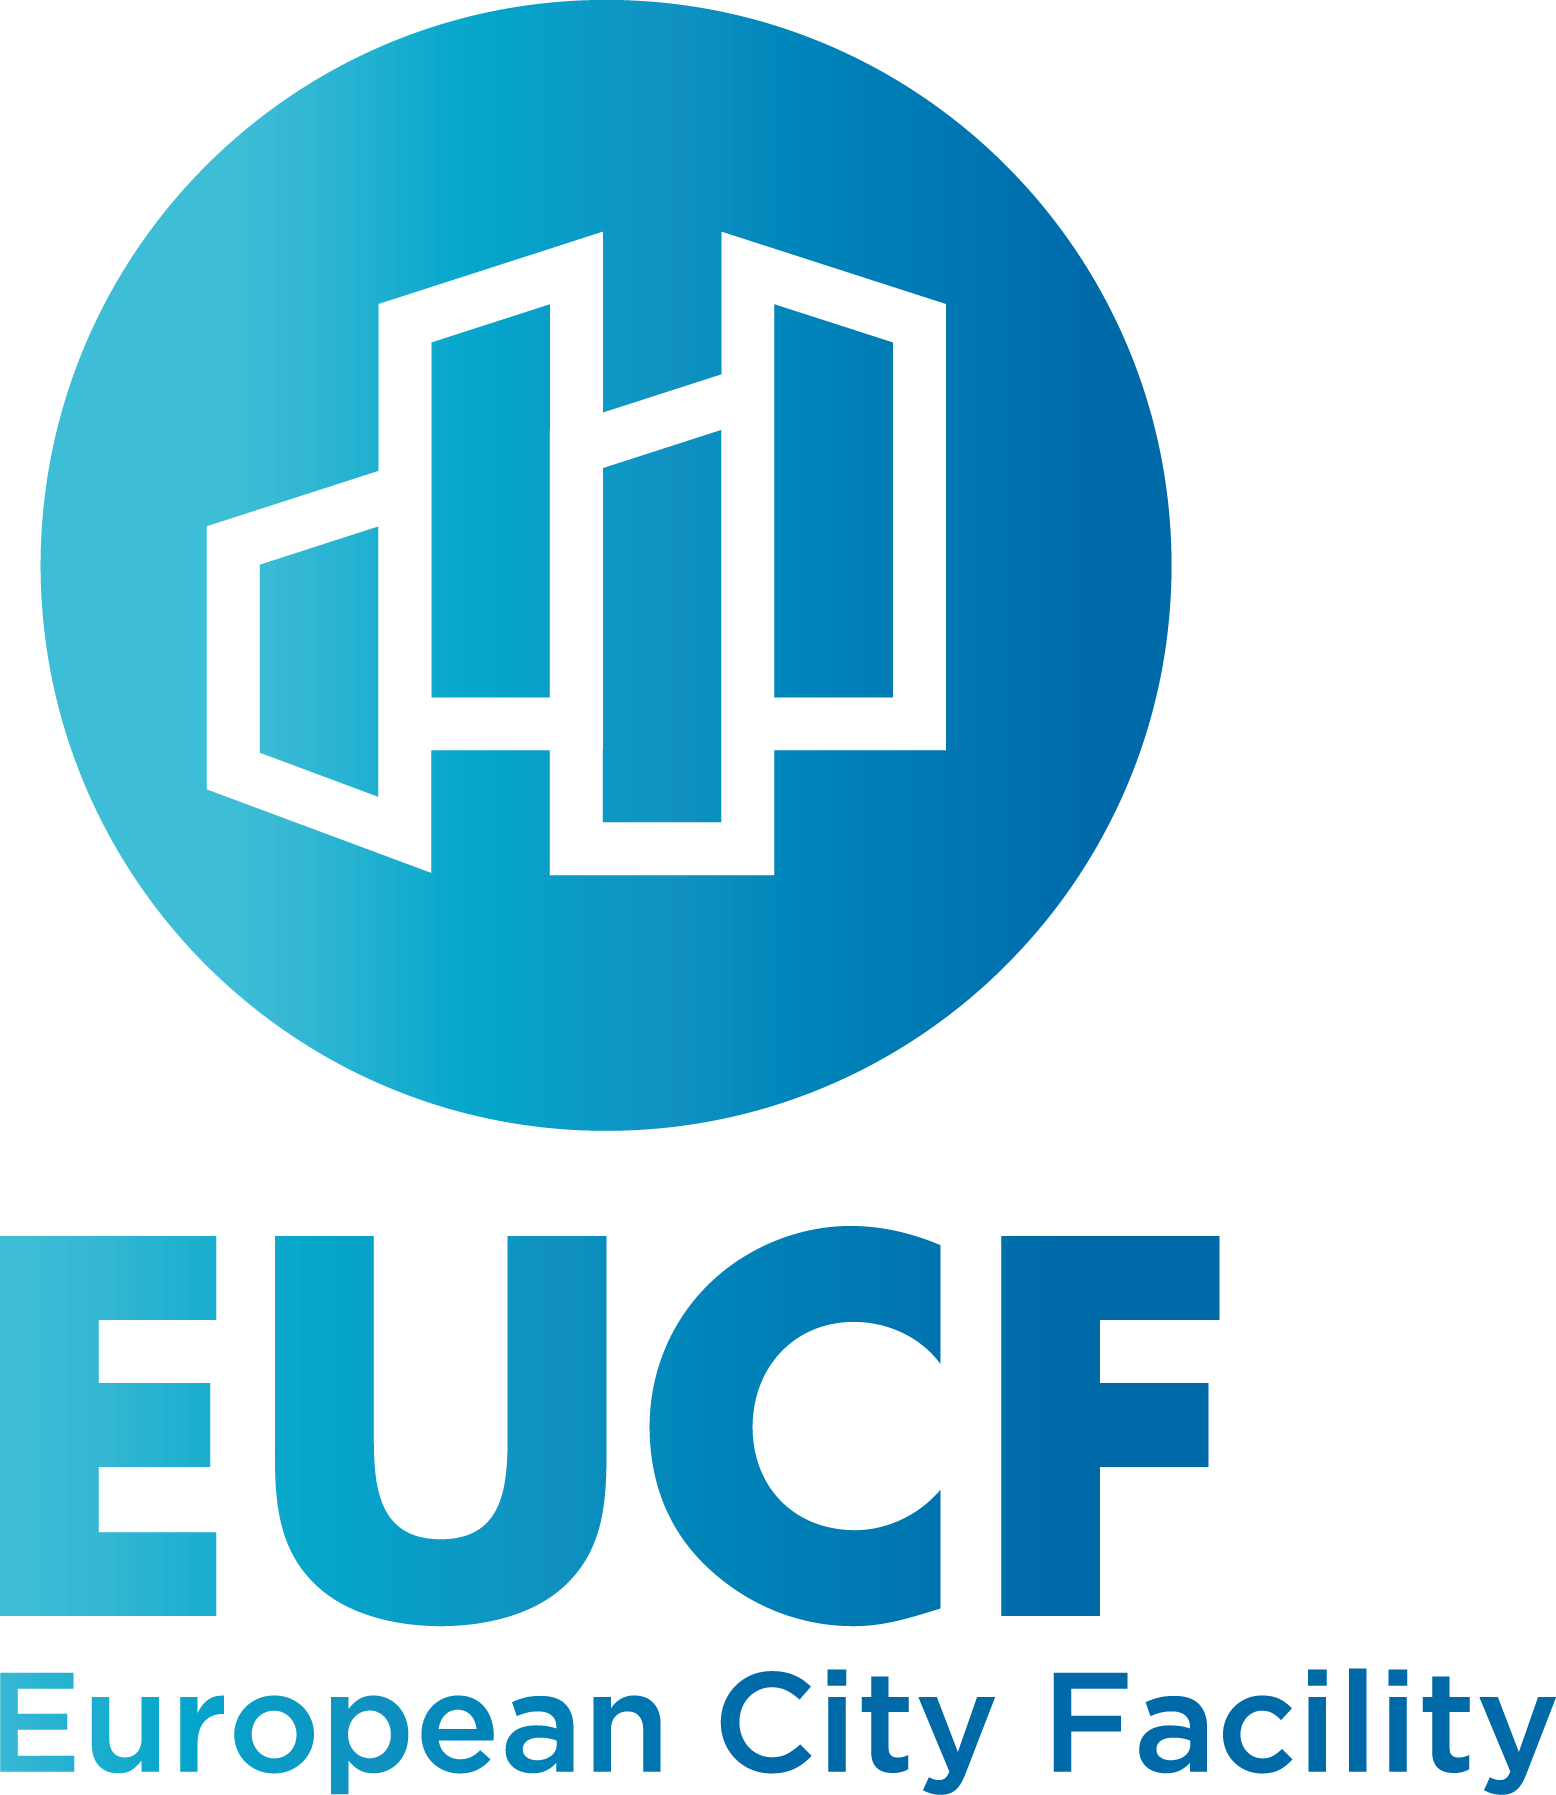 European City Facility